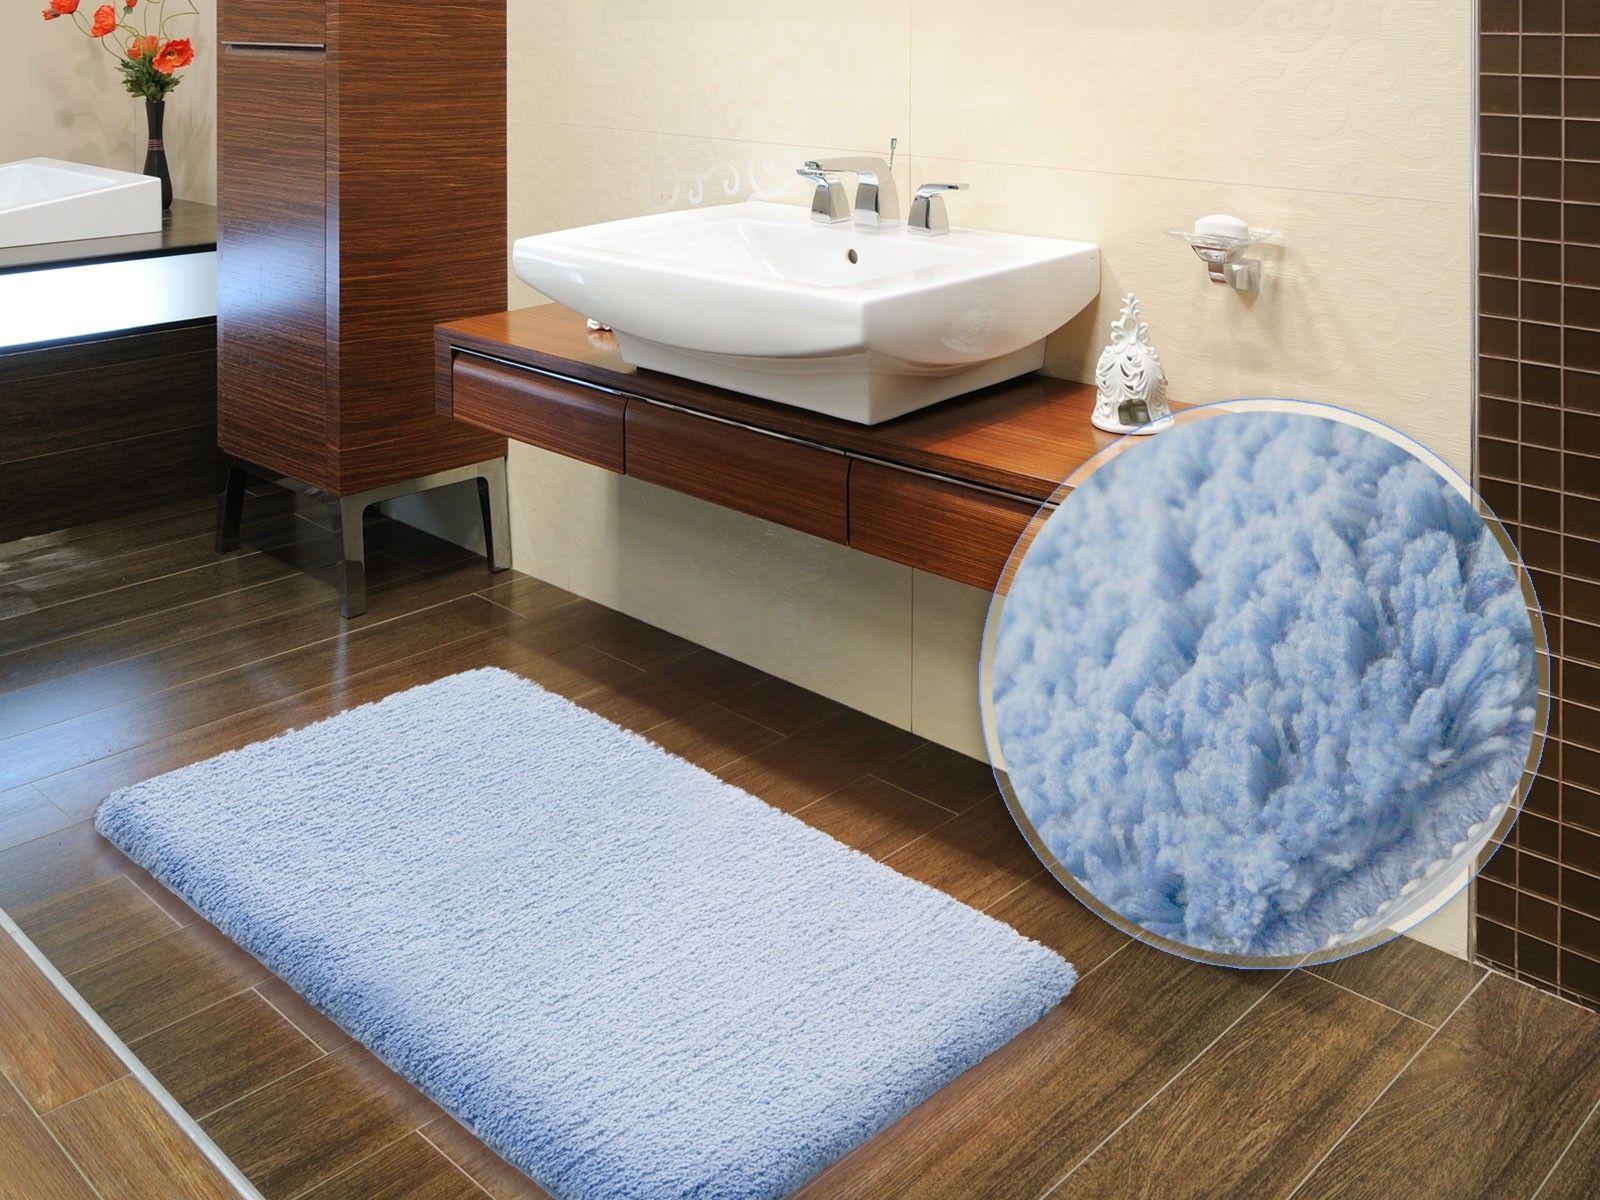 White Fluffy Bathroom Rugs Bathroom Ideas Pinterest - Black fluffy bathroom rugs for bathroom decorating ideas